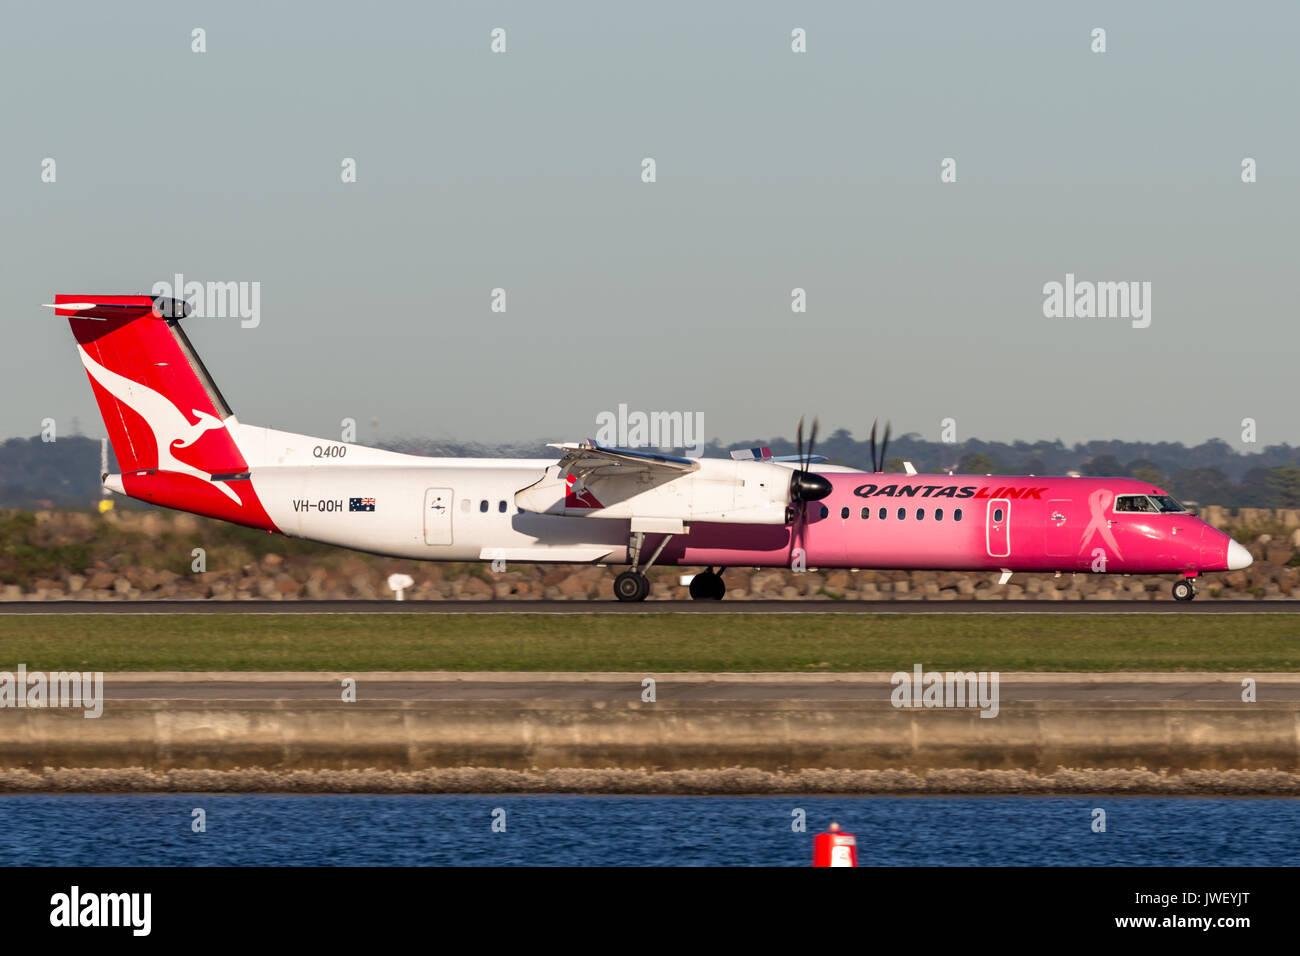 QantasLink (Qantas) deHavilland DHC-8 (Dash 8) twin engined regional airliner aircraft at Sydney Airport. Stock Photo